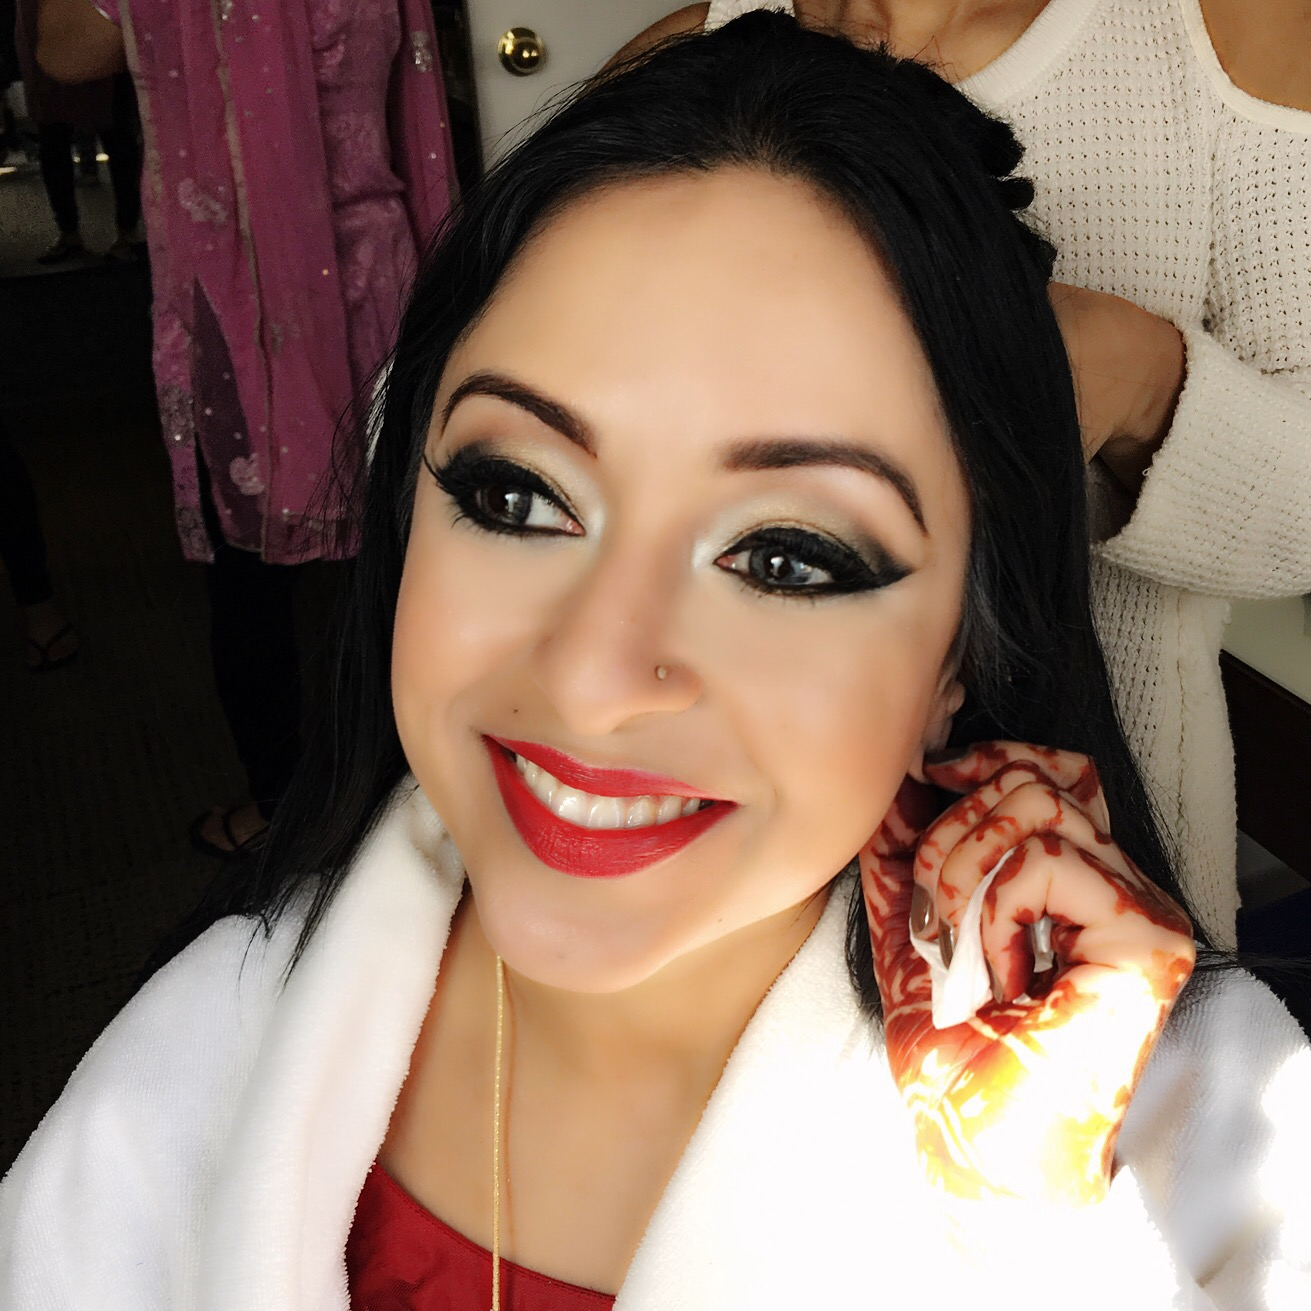 edmonton indian wedding makeup artist | Lily Le. Makeup Artist